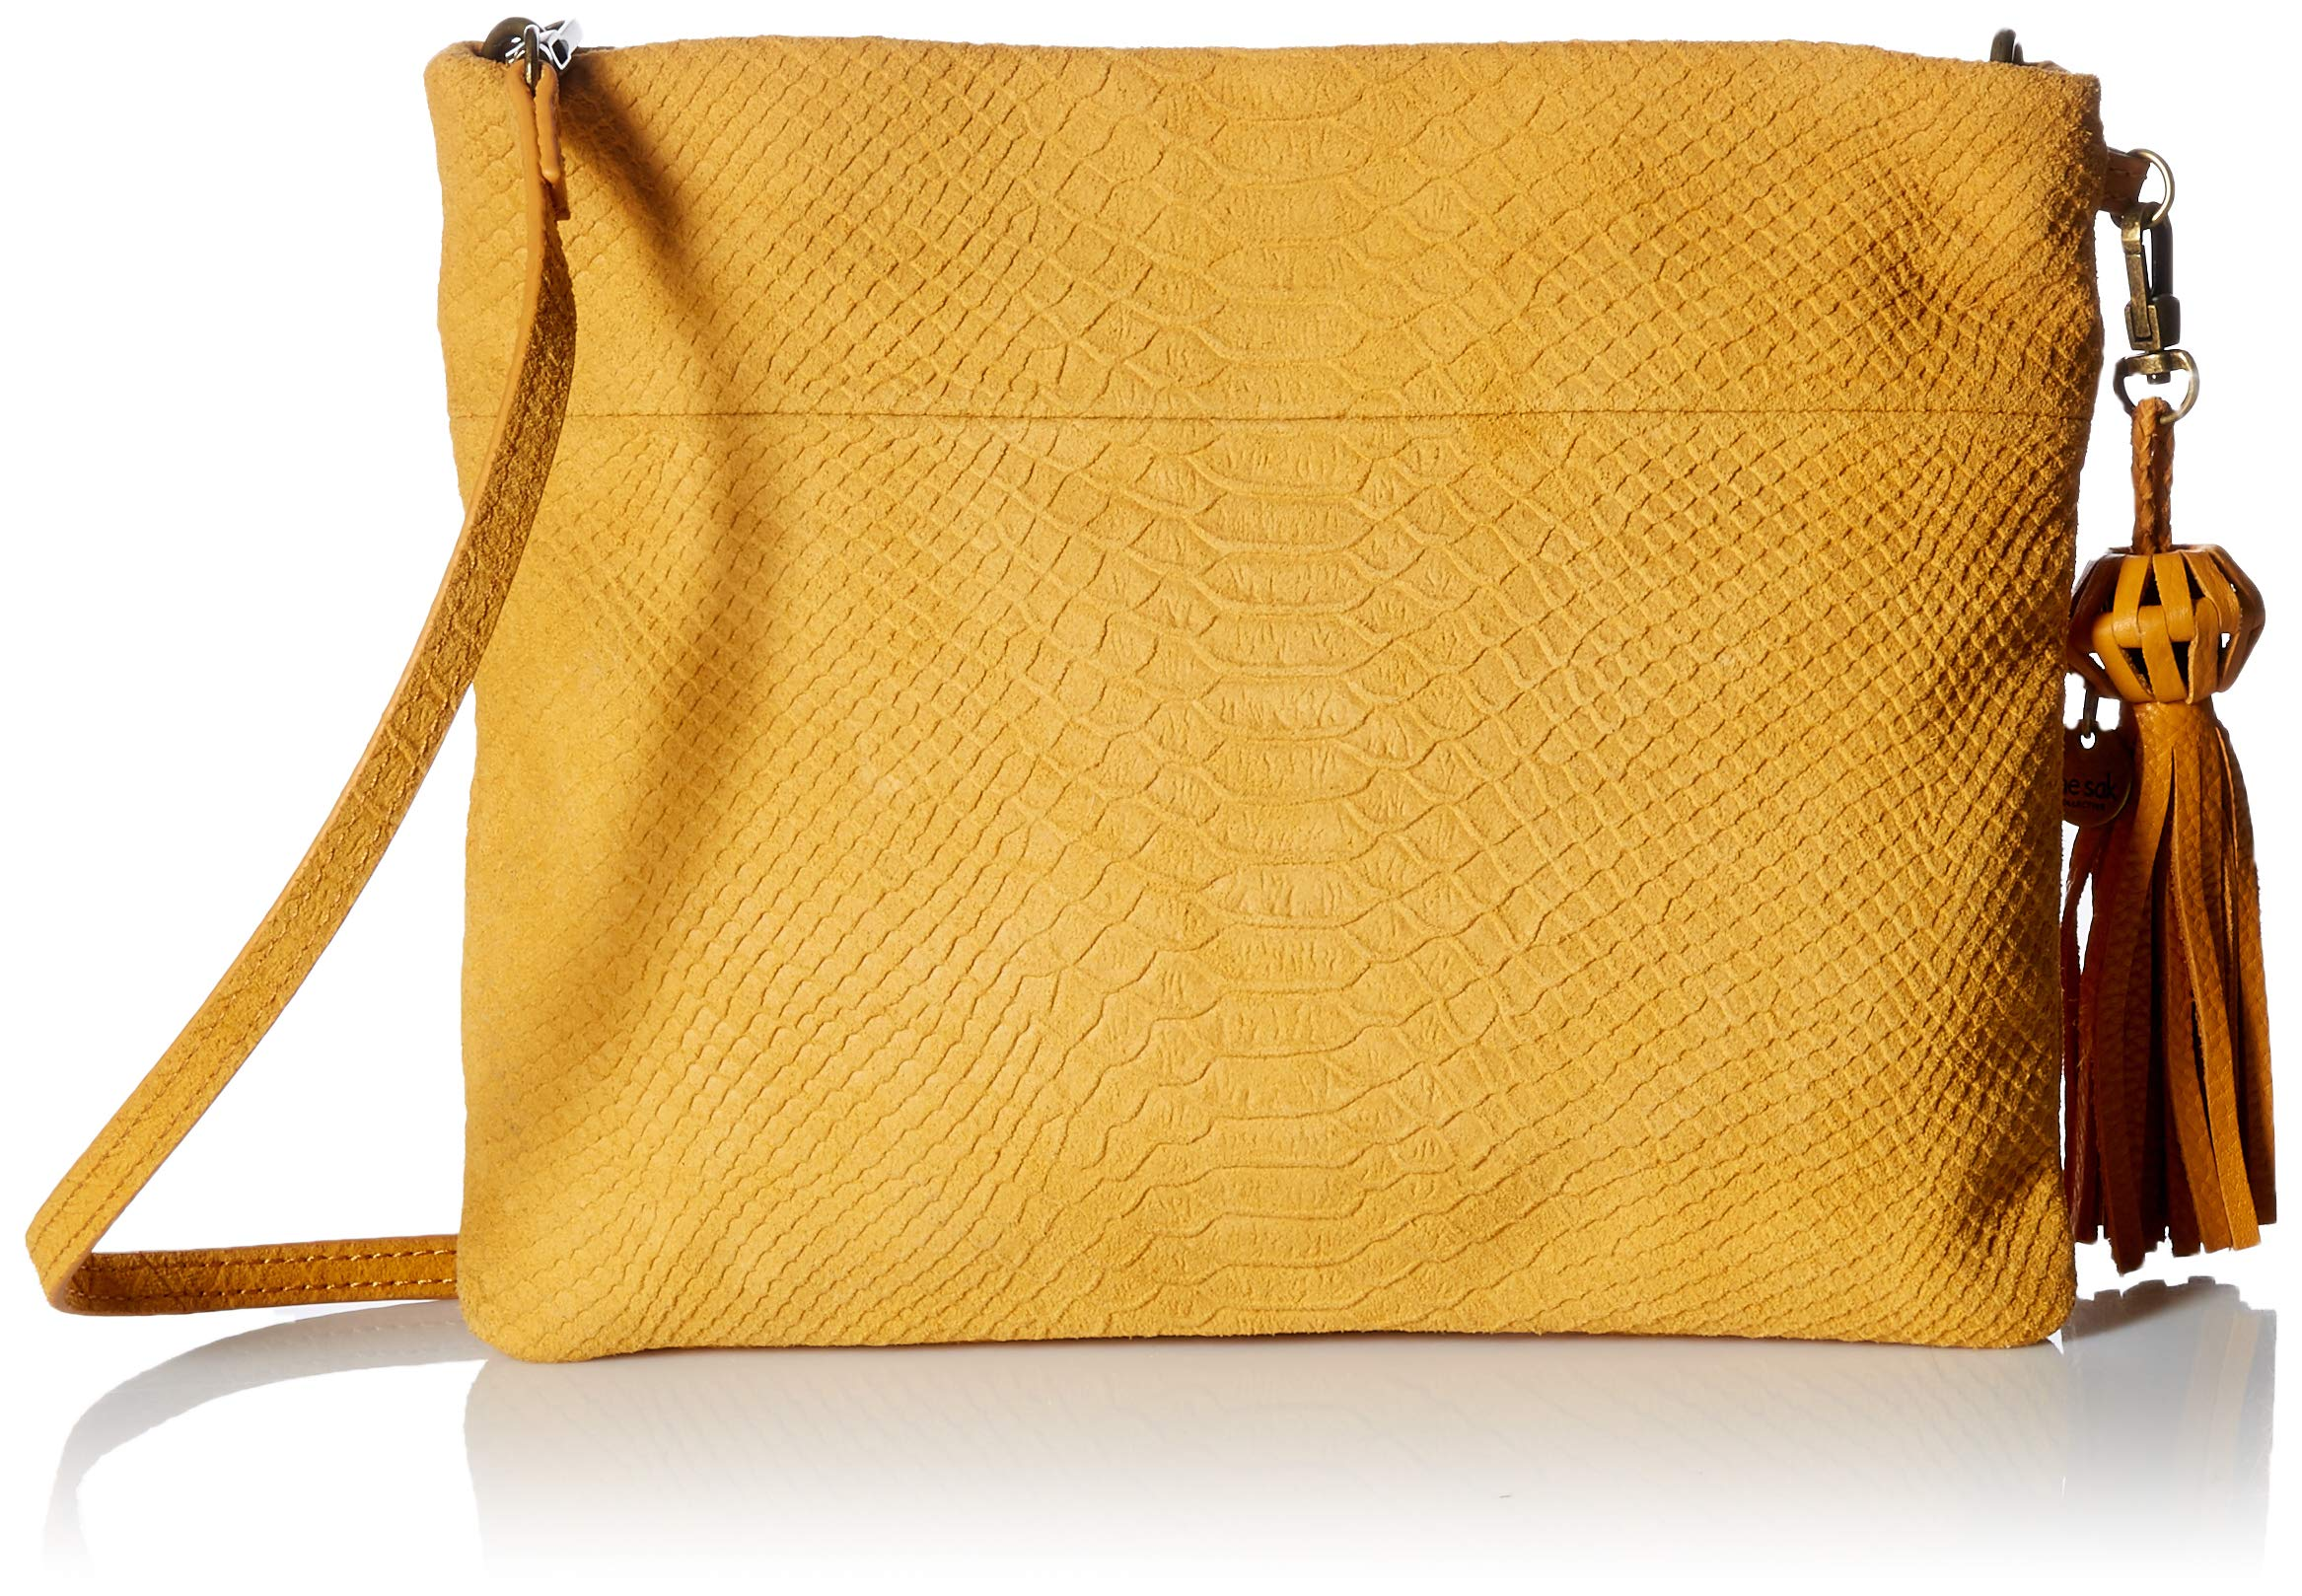 The Sak Tomboy Convertible Clutch, amber exotic